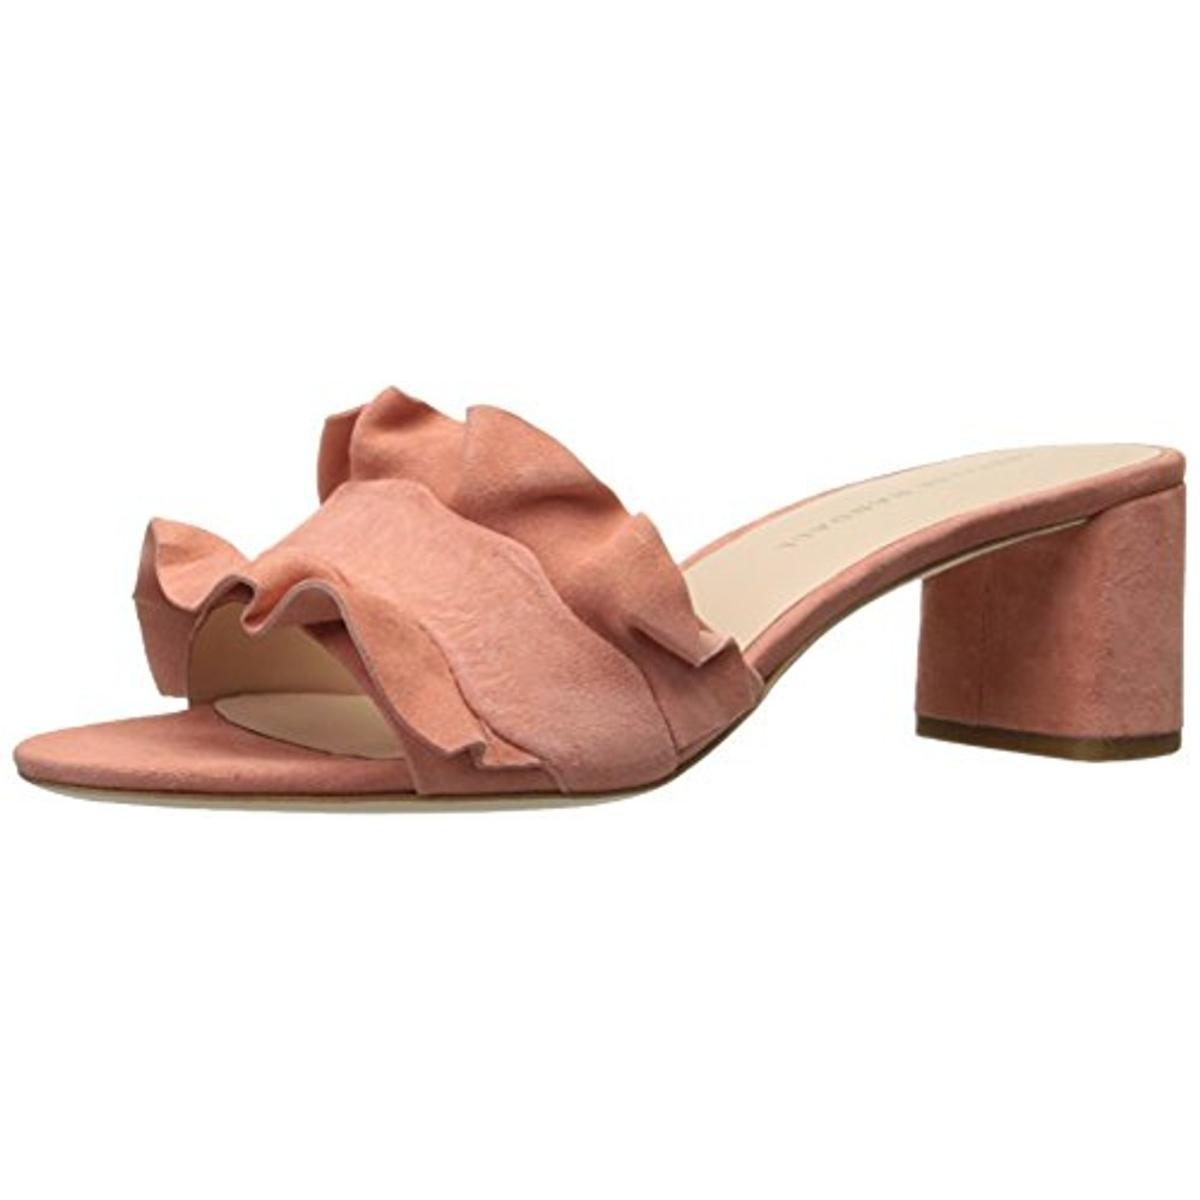 681088dd37 Shop Loeffler Randall Womens Vera Heels - Free Shipping Today - Overstock -  21480797